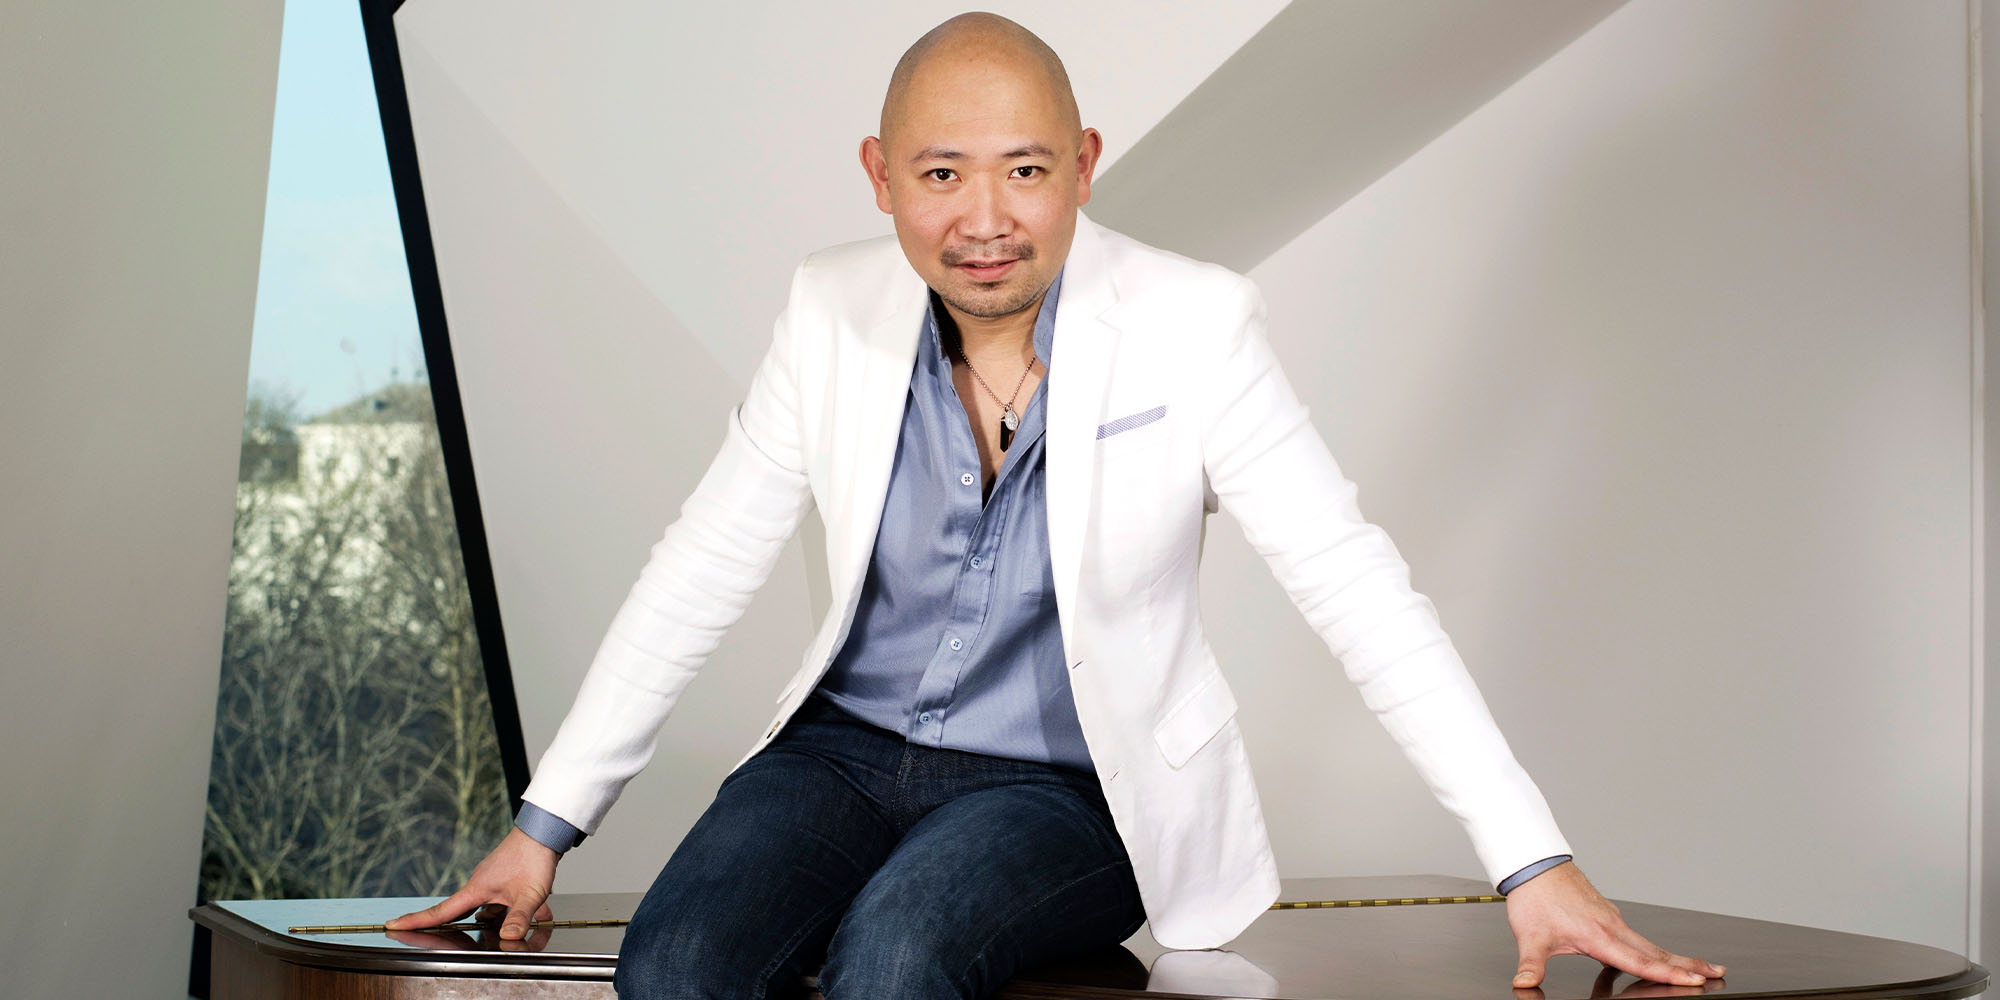 Jimmy Chiang